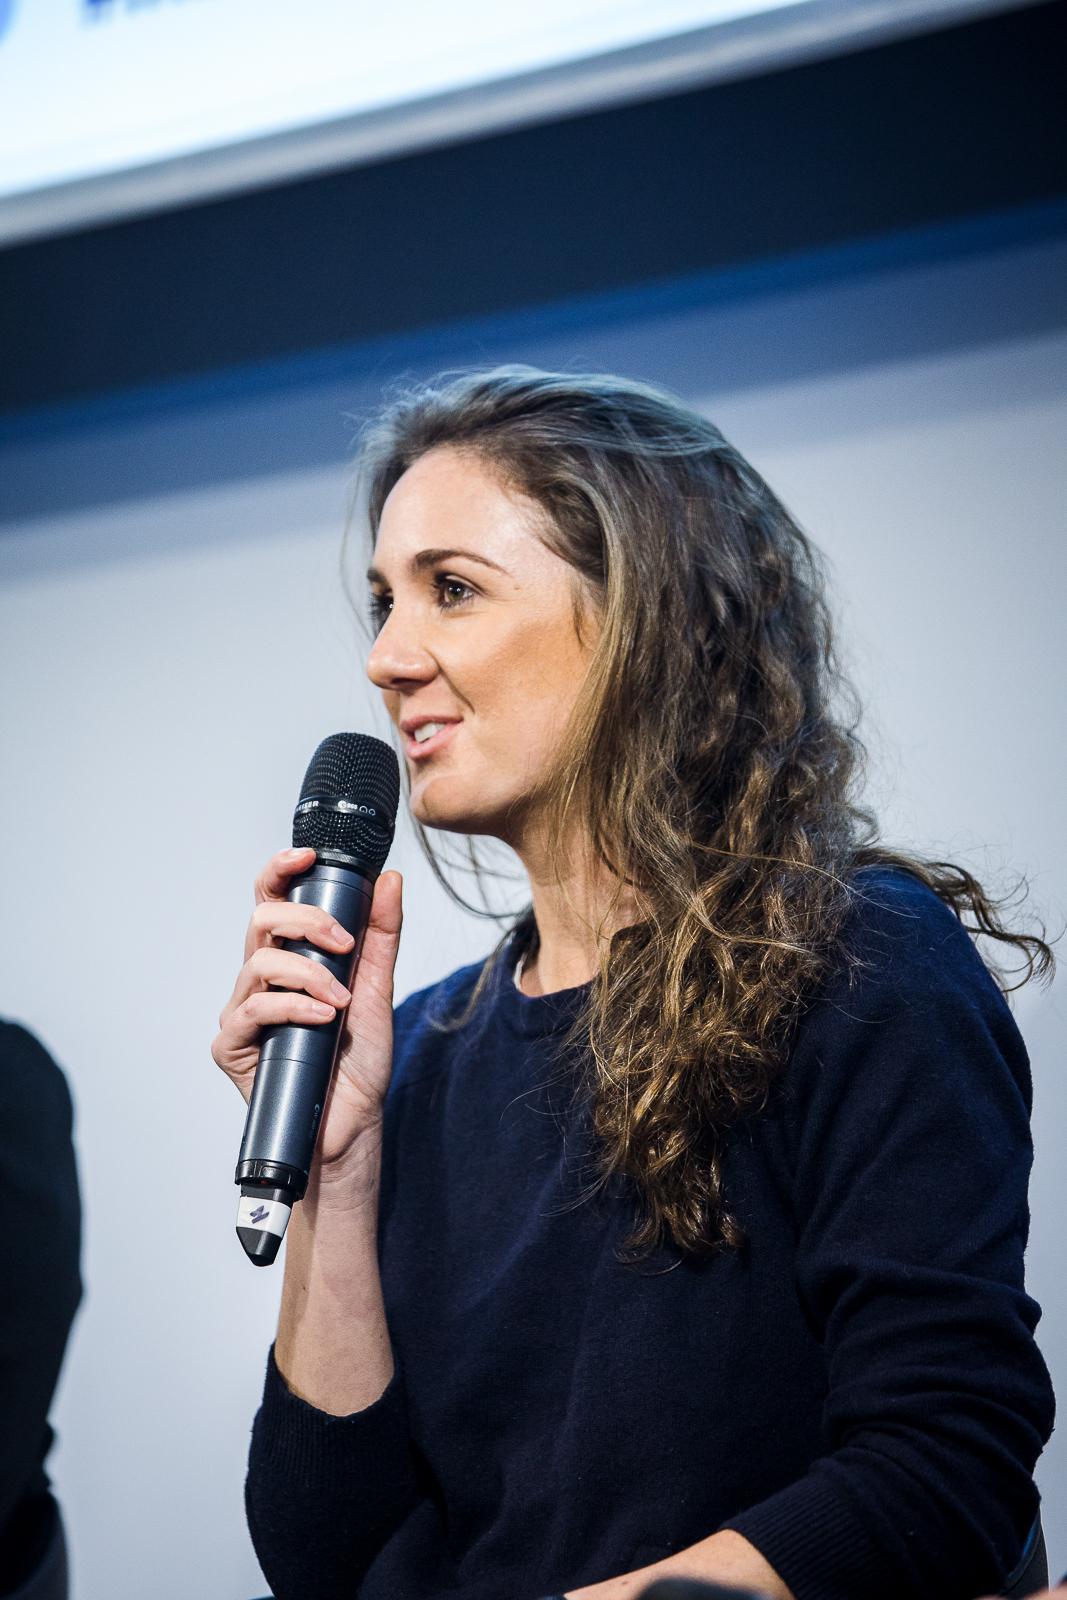 Marjolaine Grondin (Jam) - IN BANQUE 2018 - Crédit photo : Guillermo Gomez